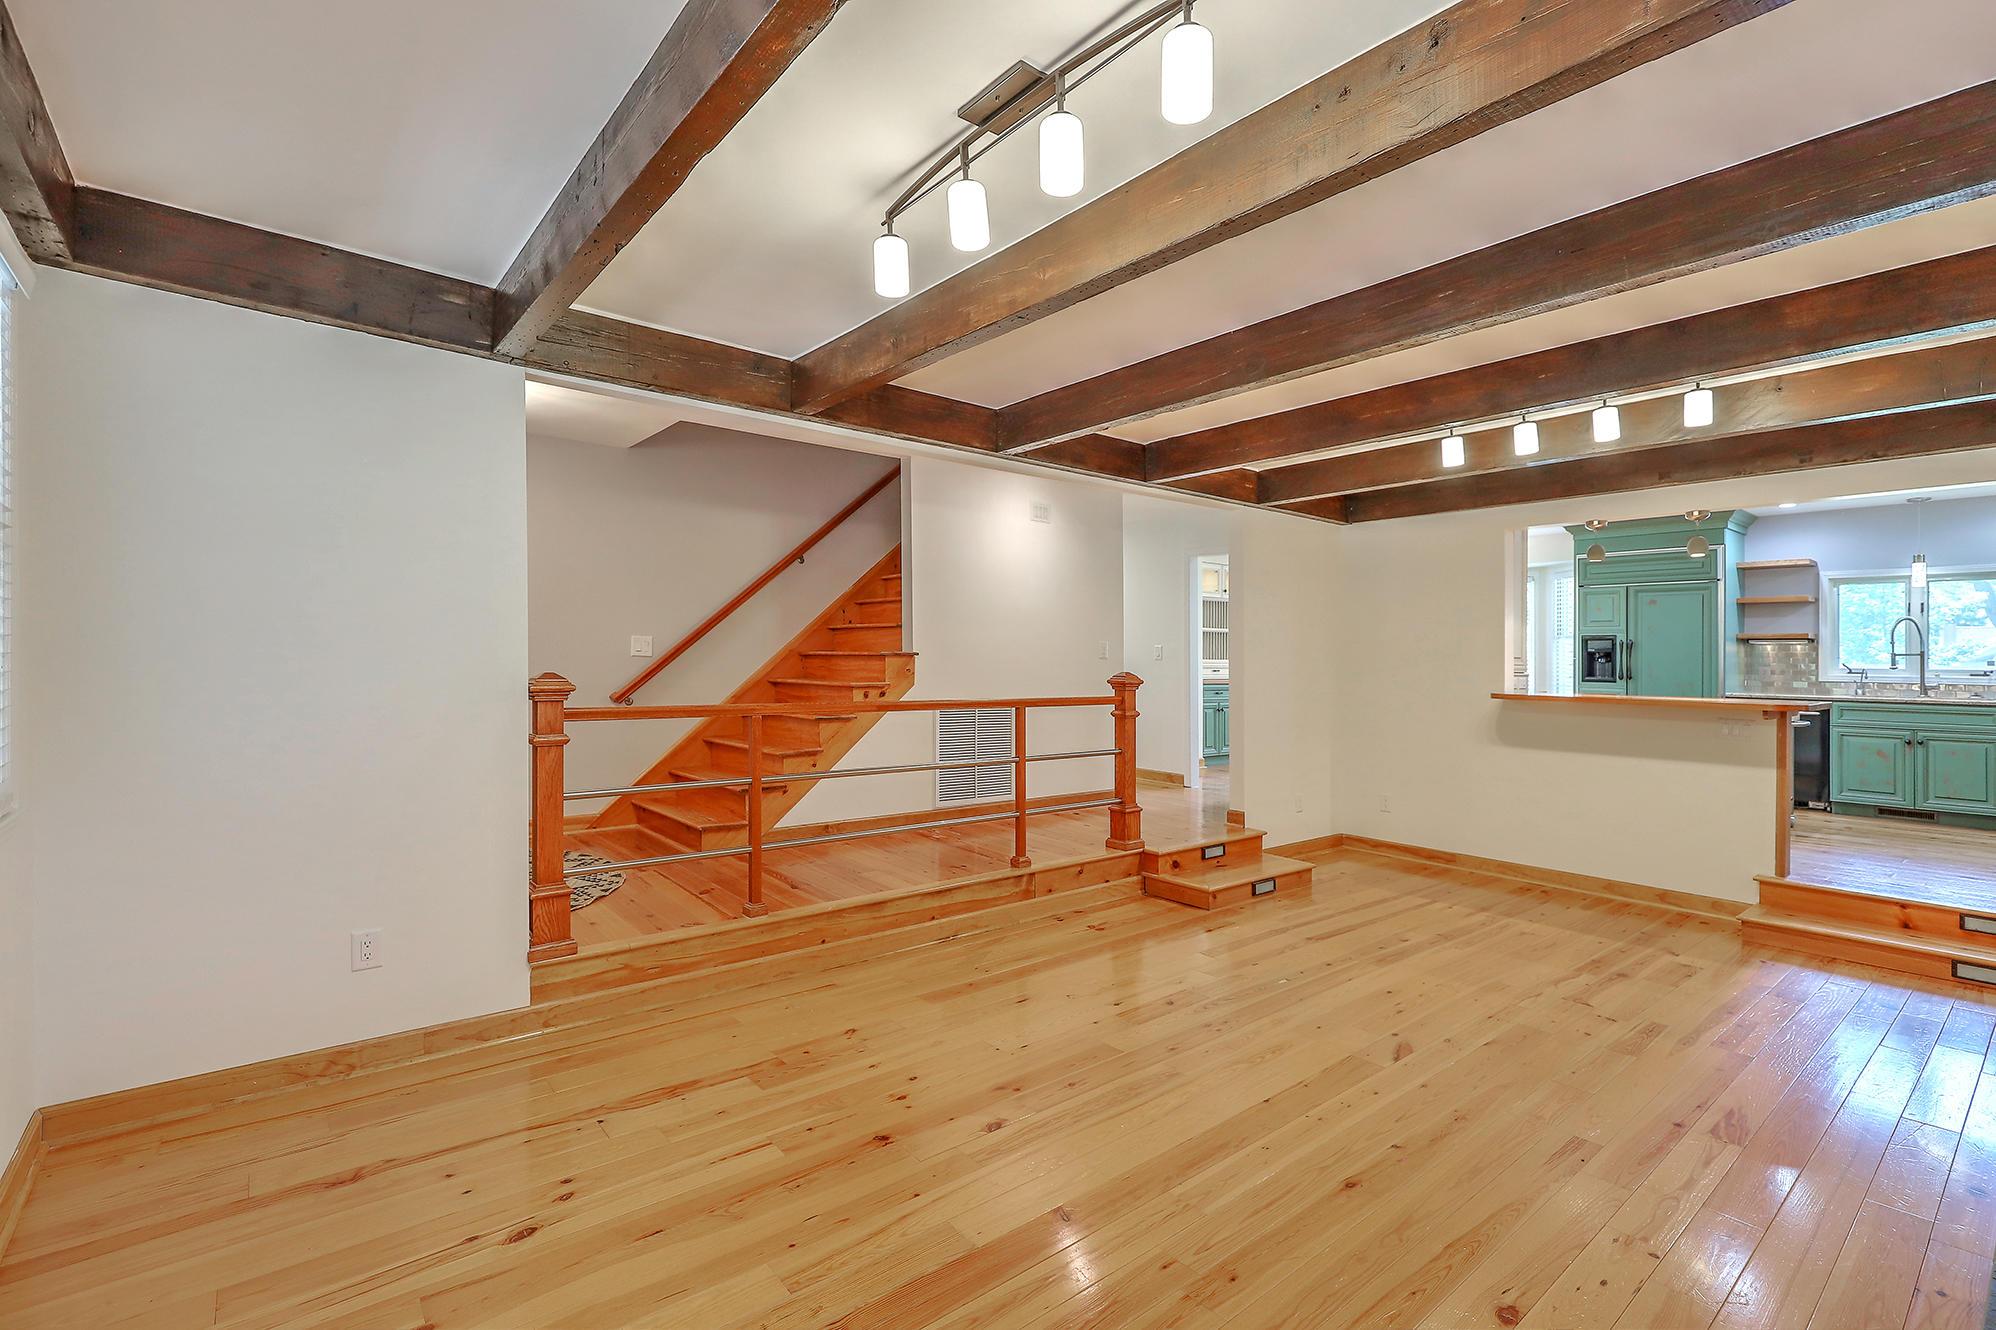 Edgewater Park Homes For Sale - 1413 Edsent, Charleston, SC - 2